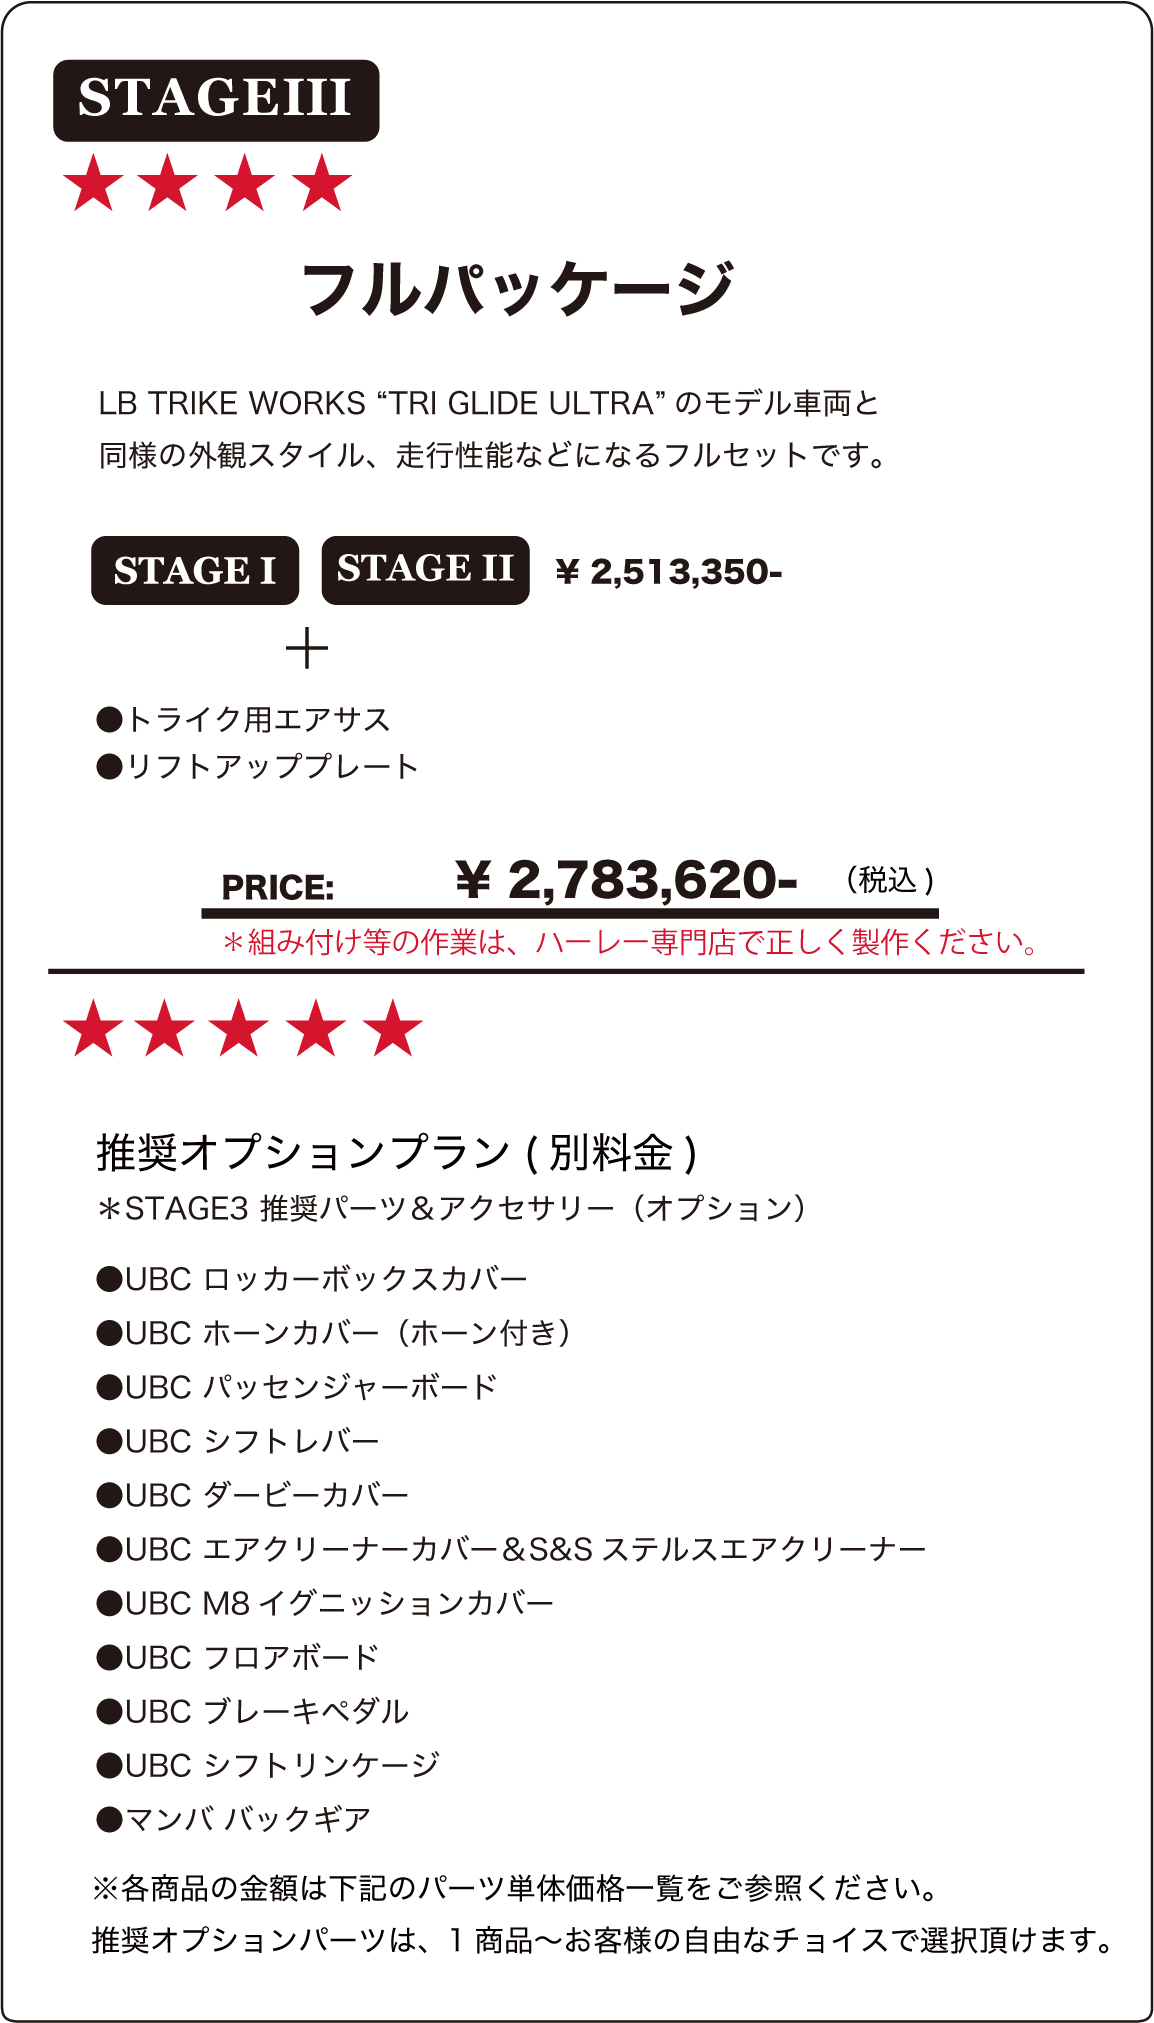 "STAGE 3 TRI GLIDE ULTRA 2014~ ""LBSTAGE2STAGE1 TRIKEWORKS ""BODY KIT"